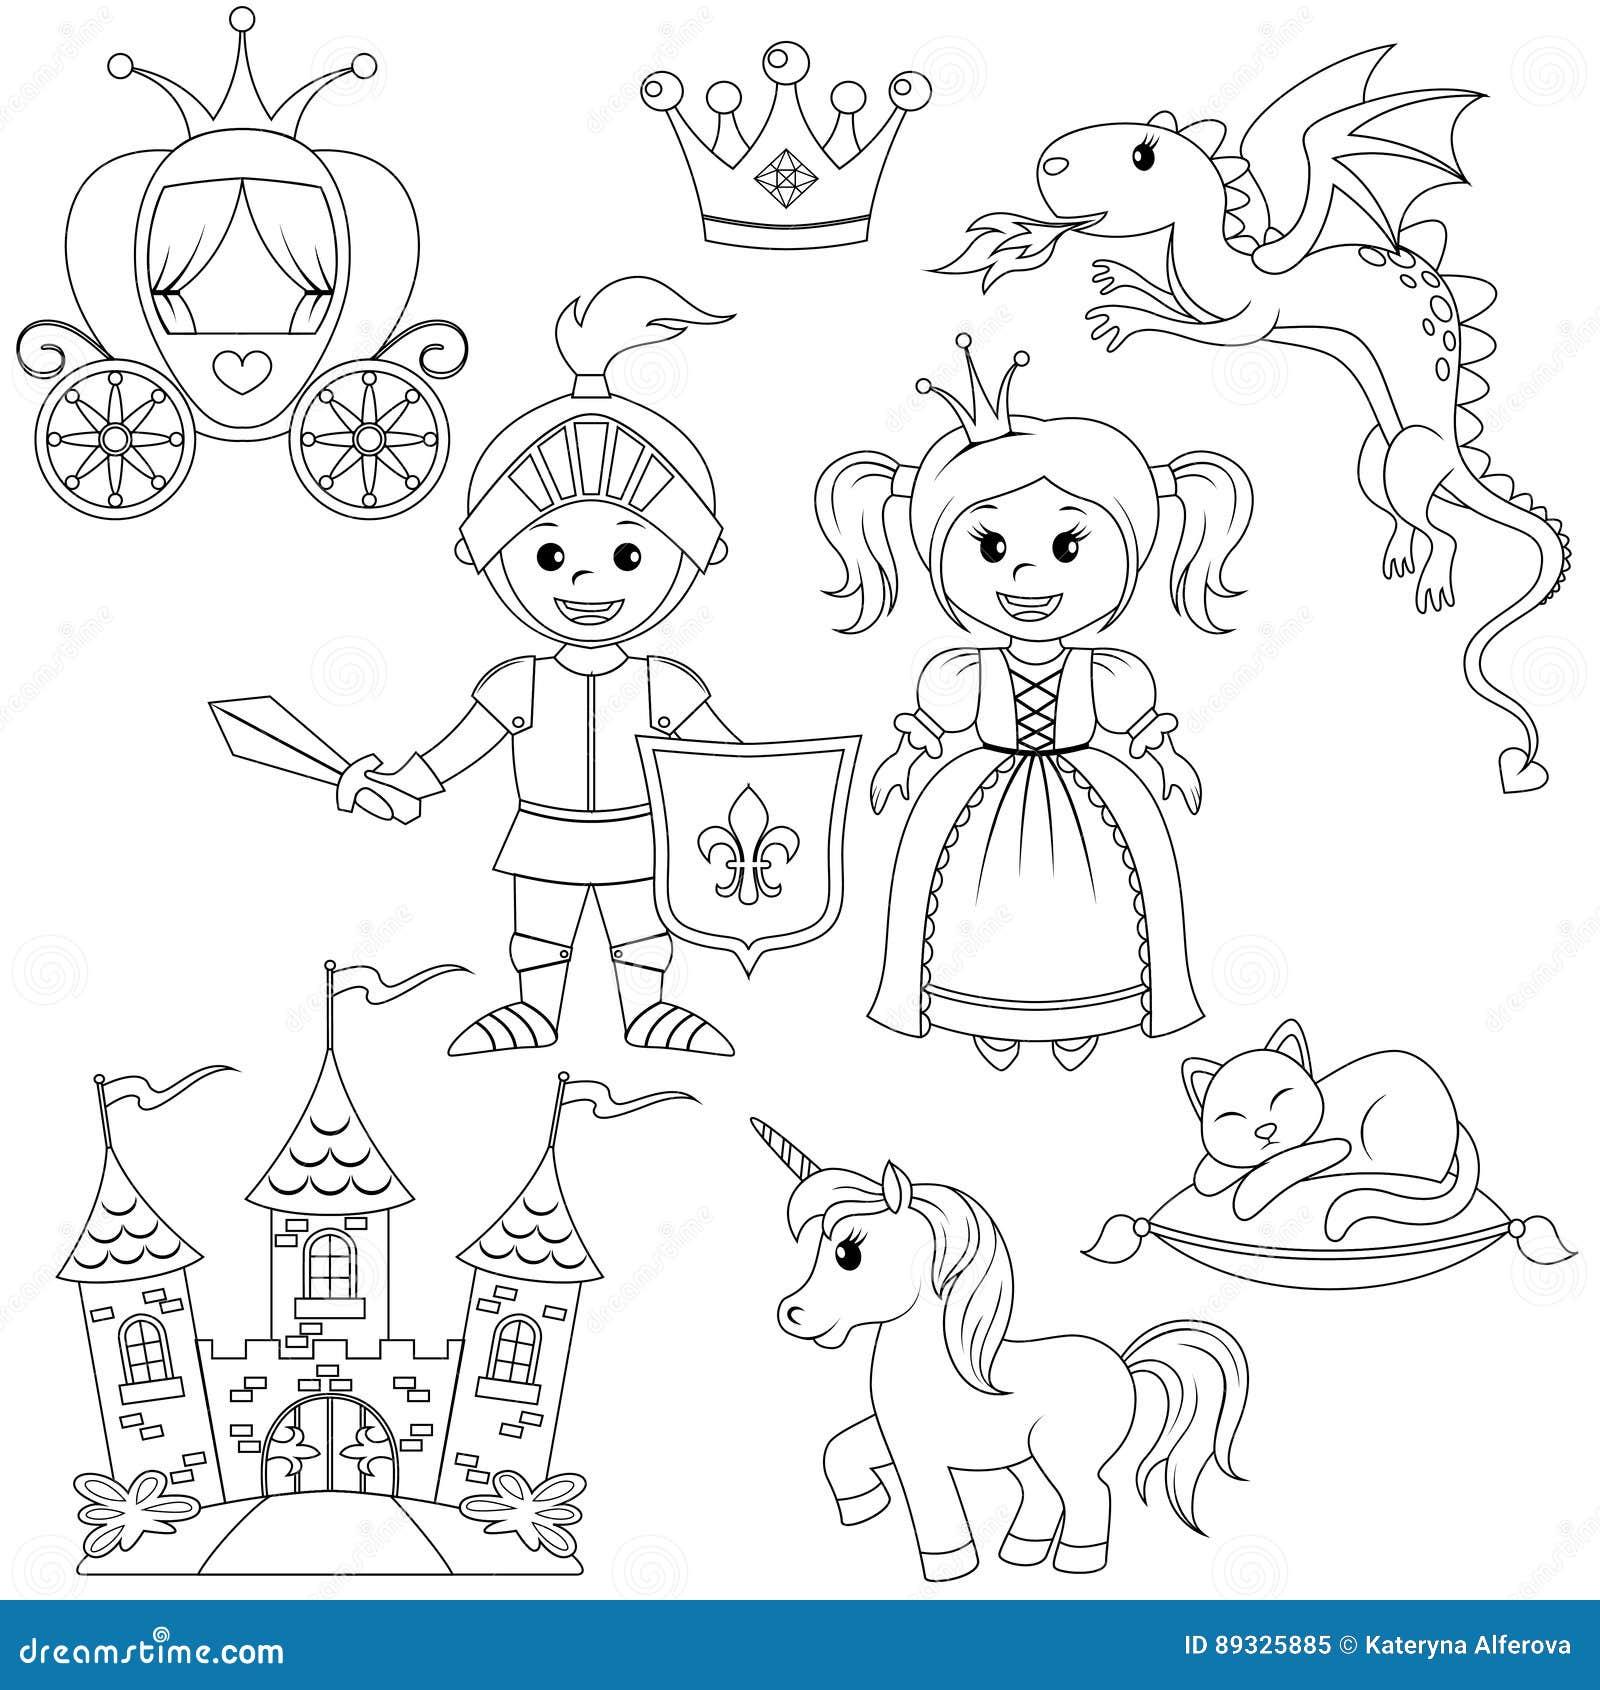 Queen Cartoons, Illustrations & Vector Stock Images ...